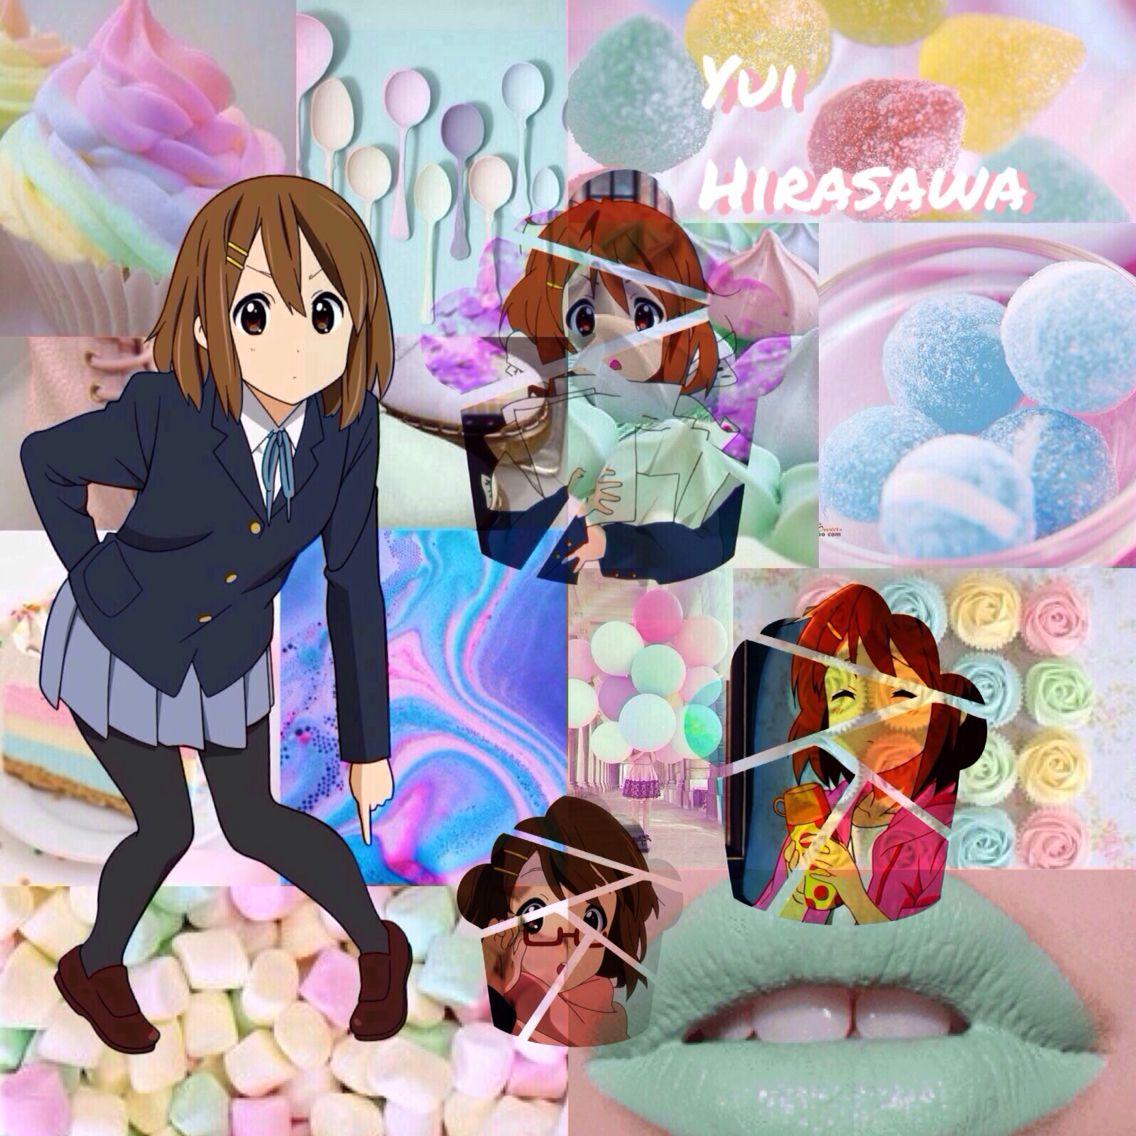 Yui Hirasawa pastel edit Pastel edits, Anime, Photo editing